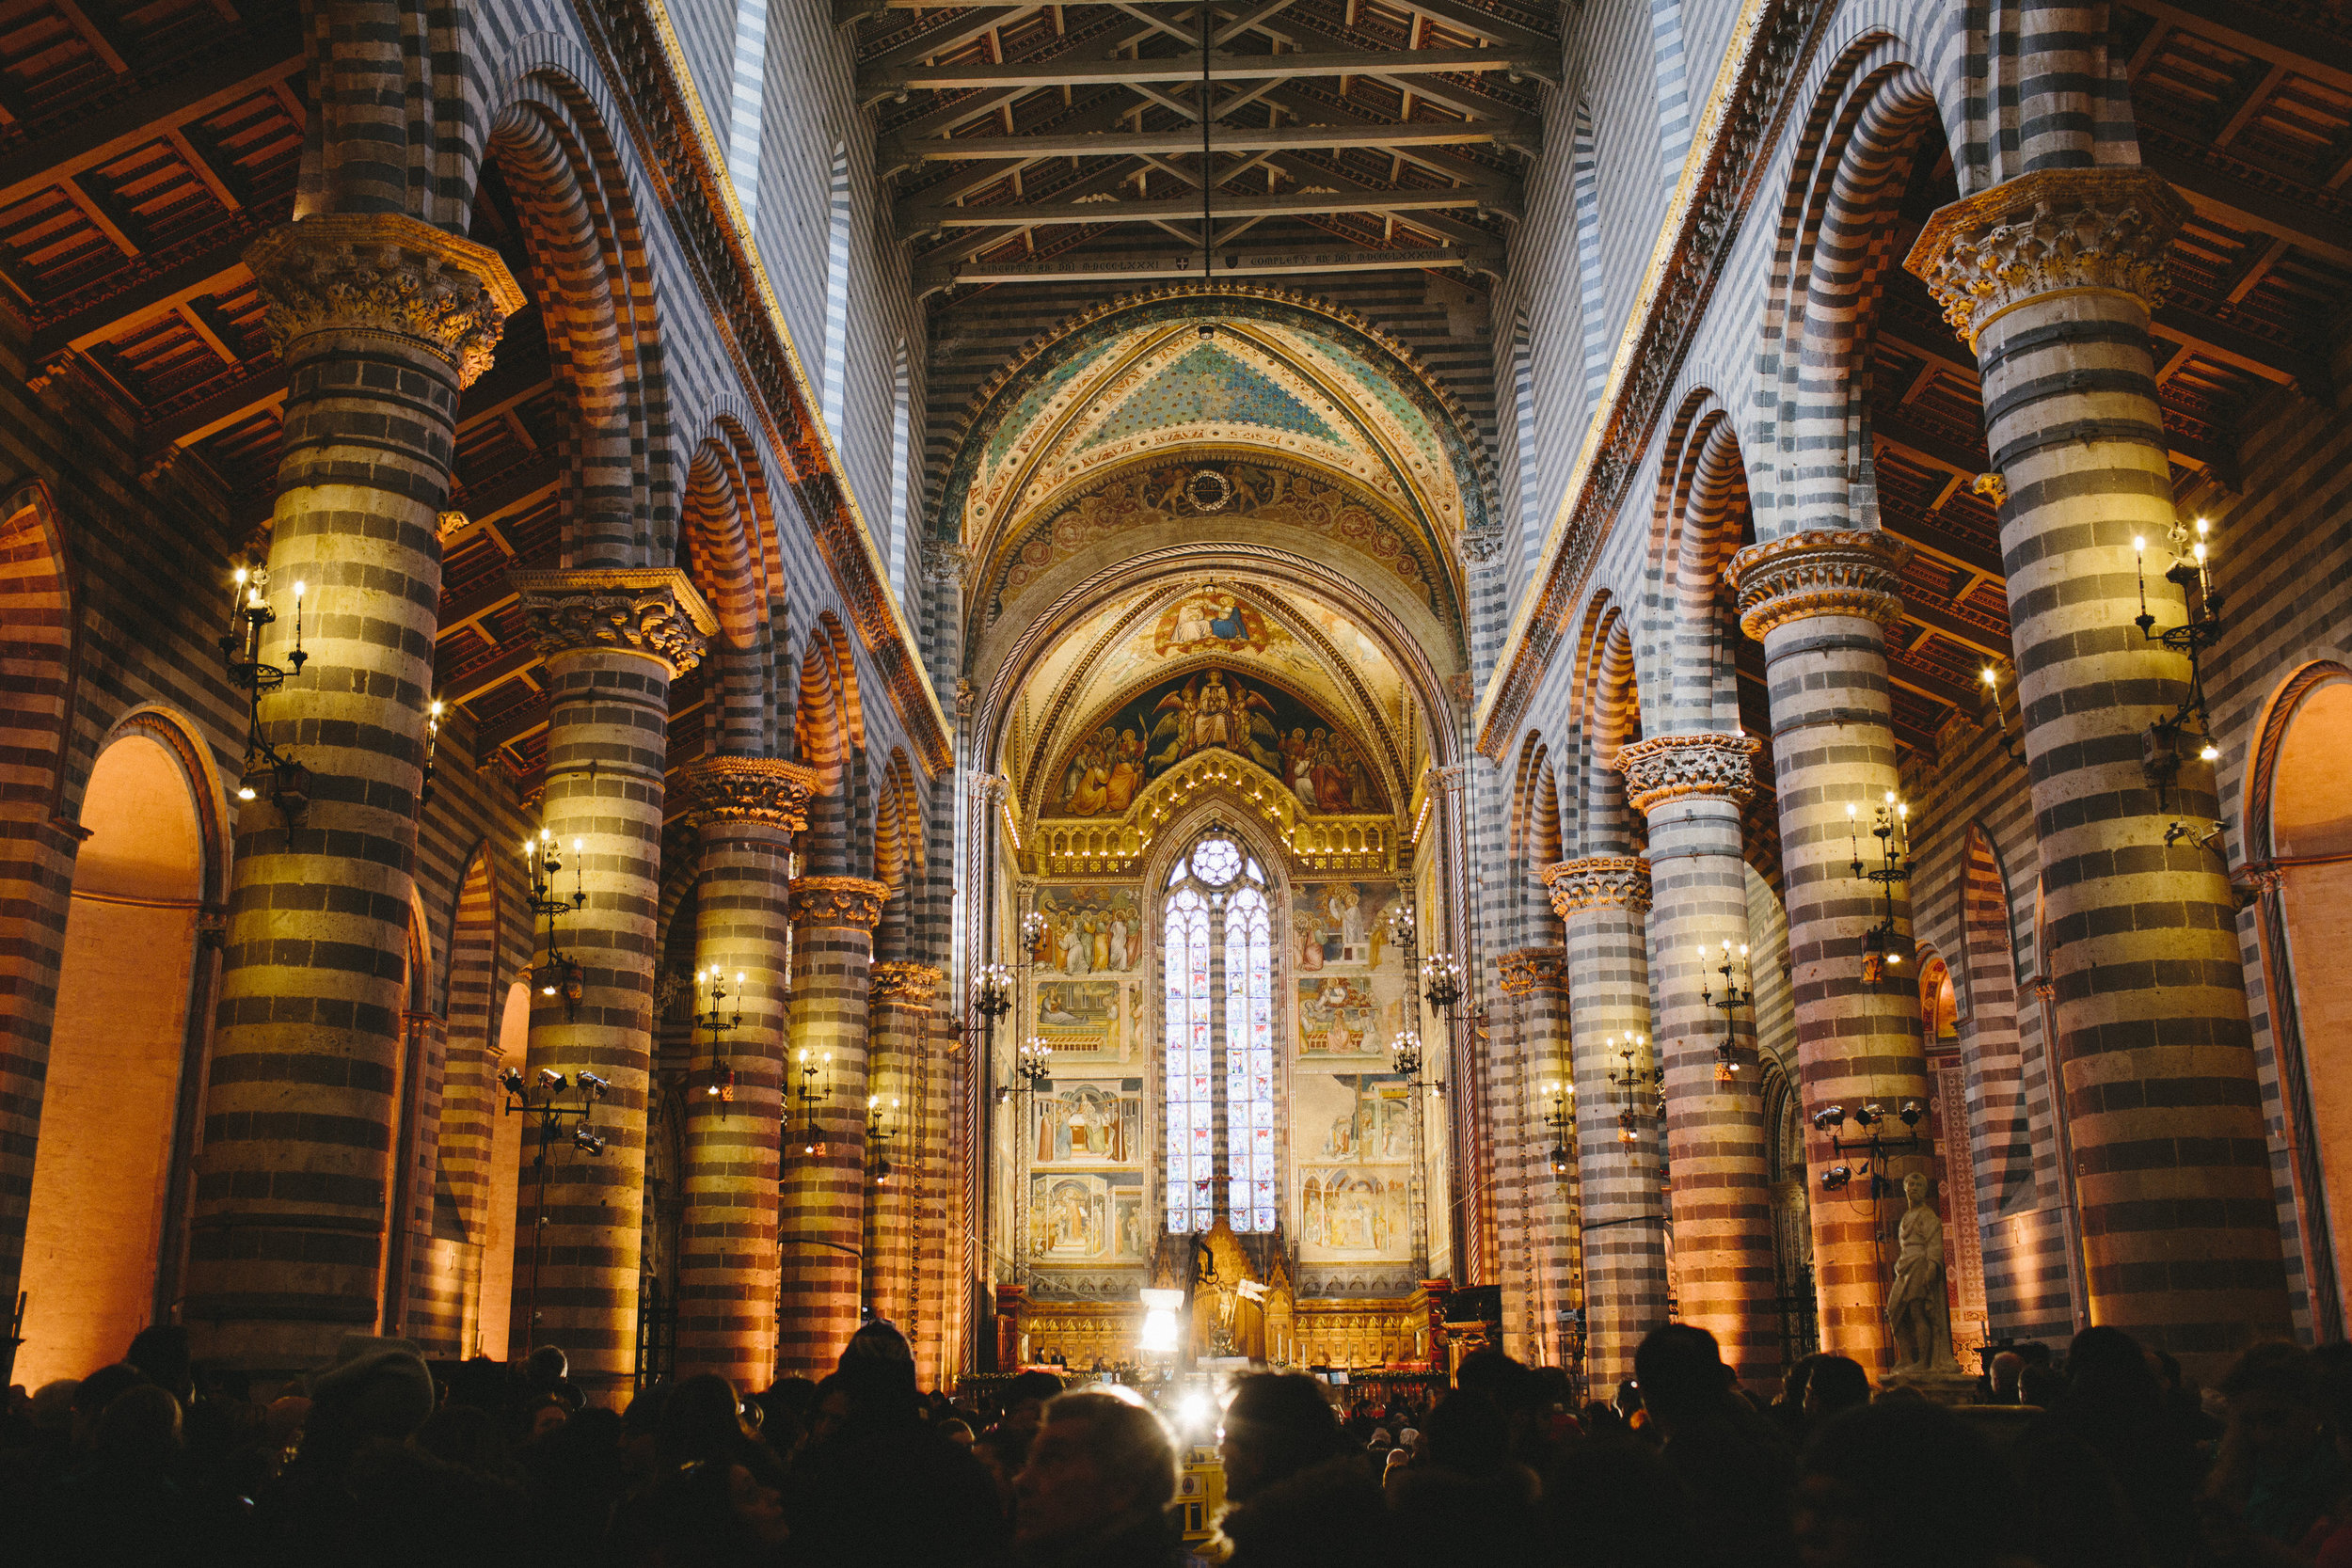 The interior of the Duomo (Photograph by Miranda Fuchs).